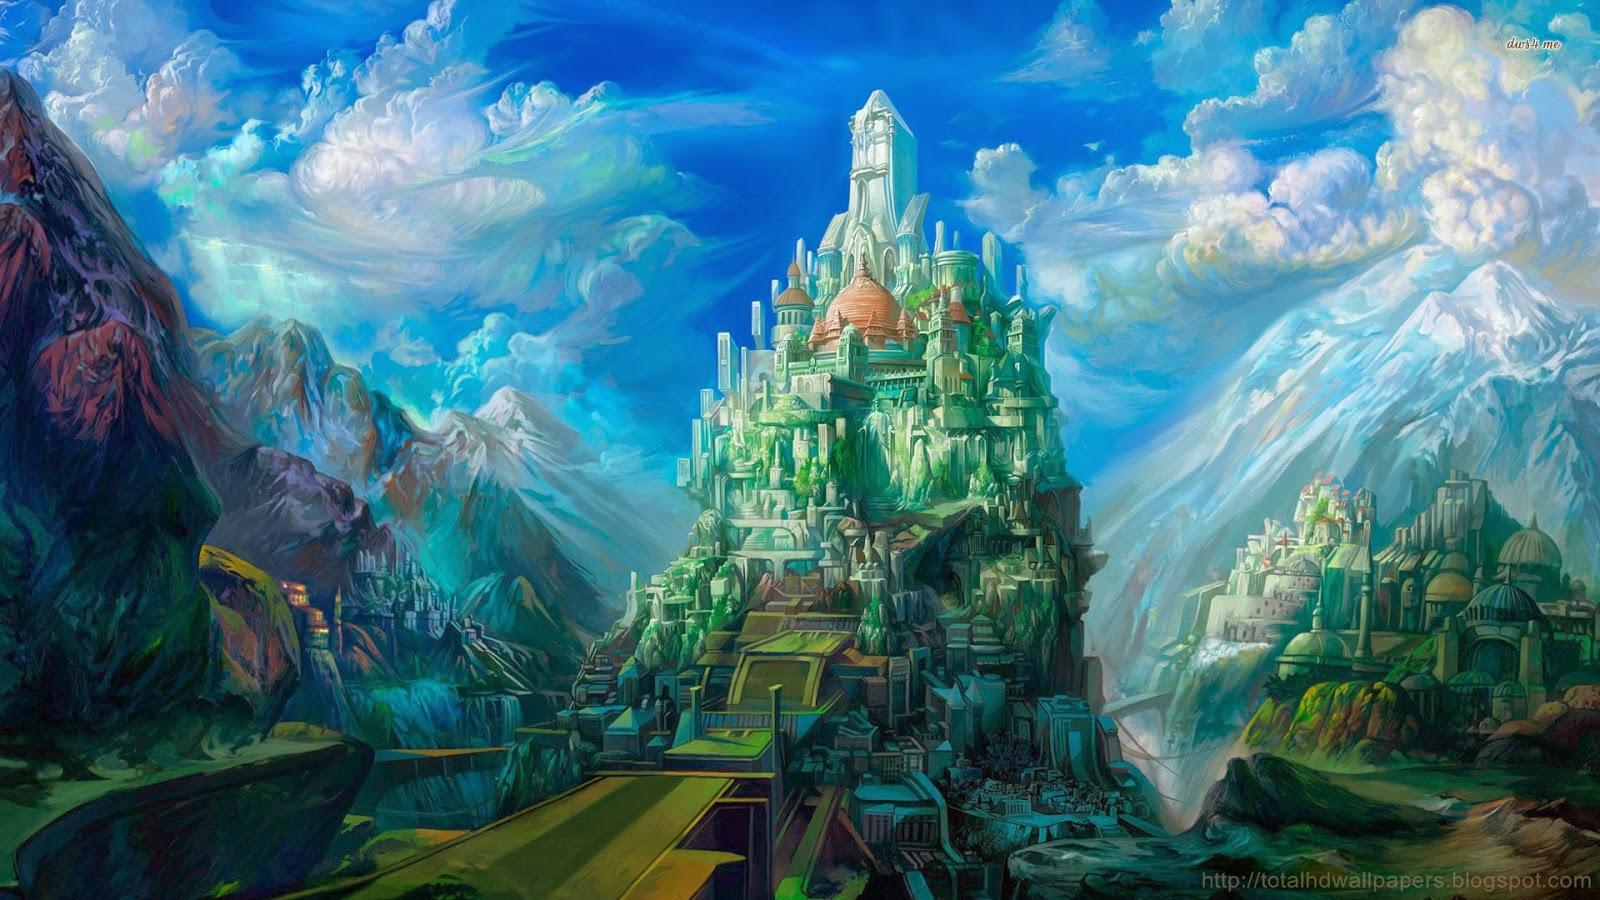 Beautiful Wallpapers For Desktop Dreamy Fantasy Wallpapers